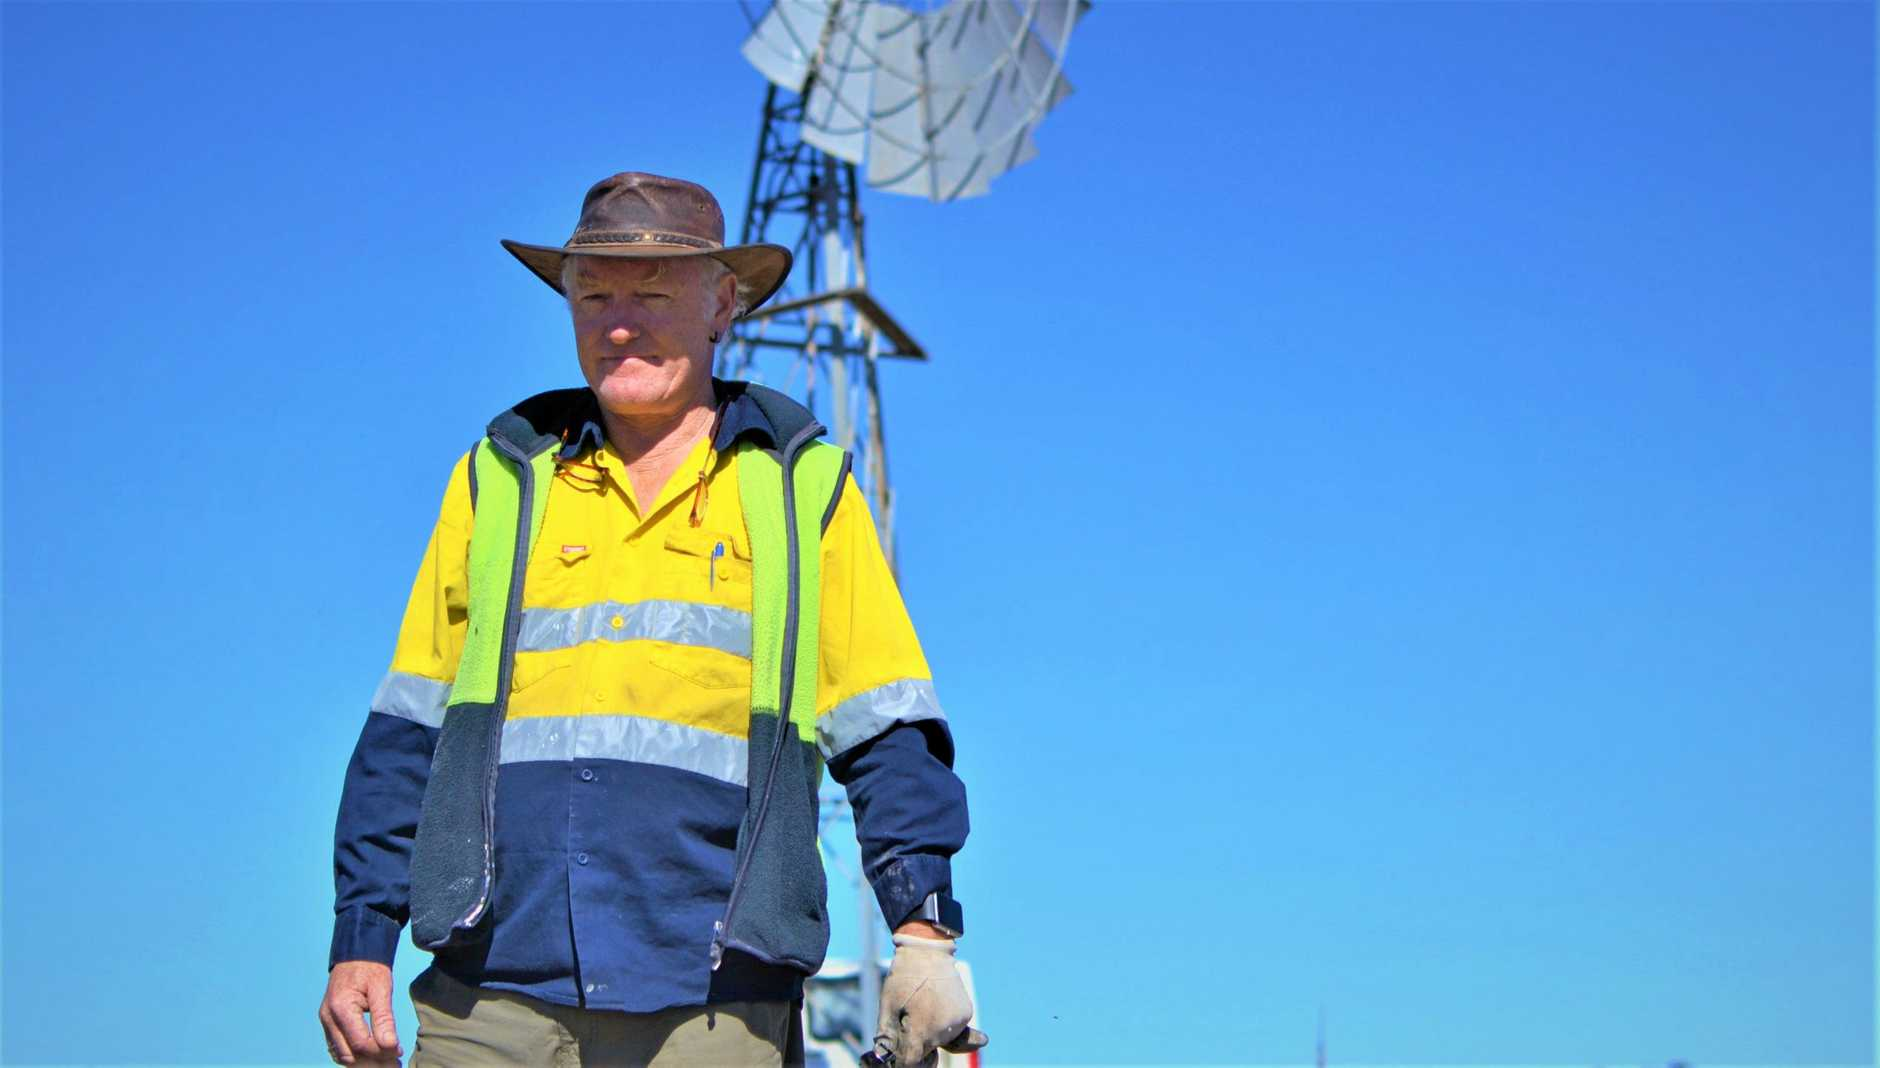 Chris Hudson from Yangan works on a windmill near Junabee drought paddock